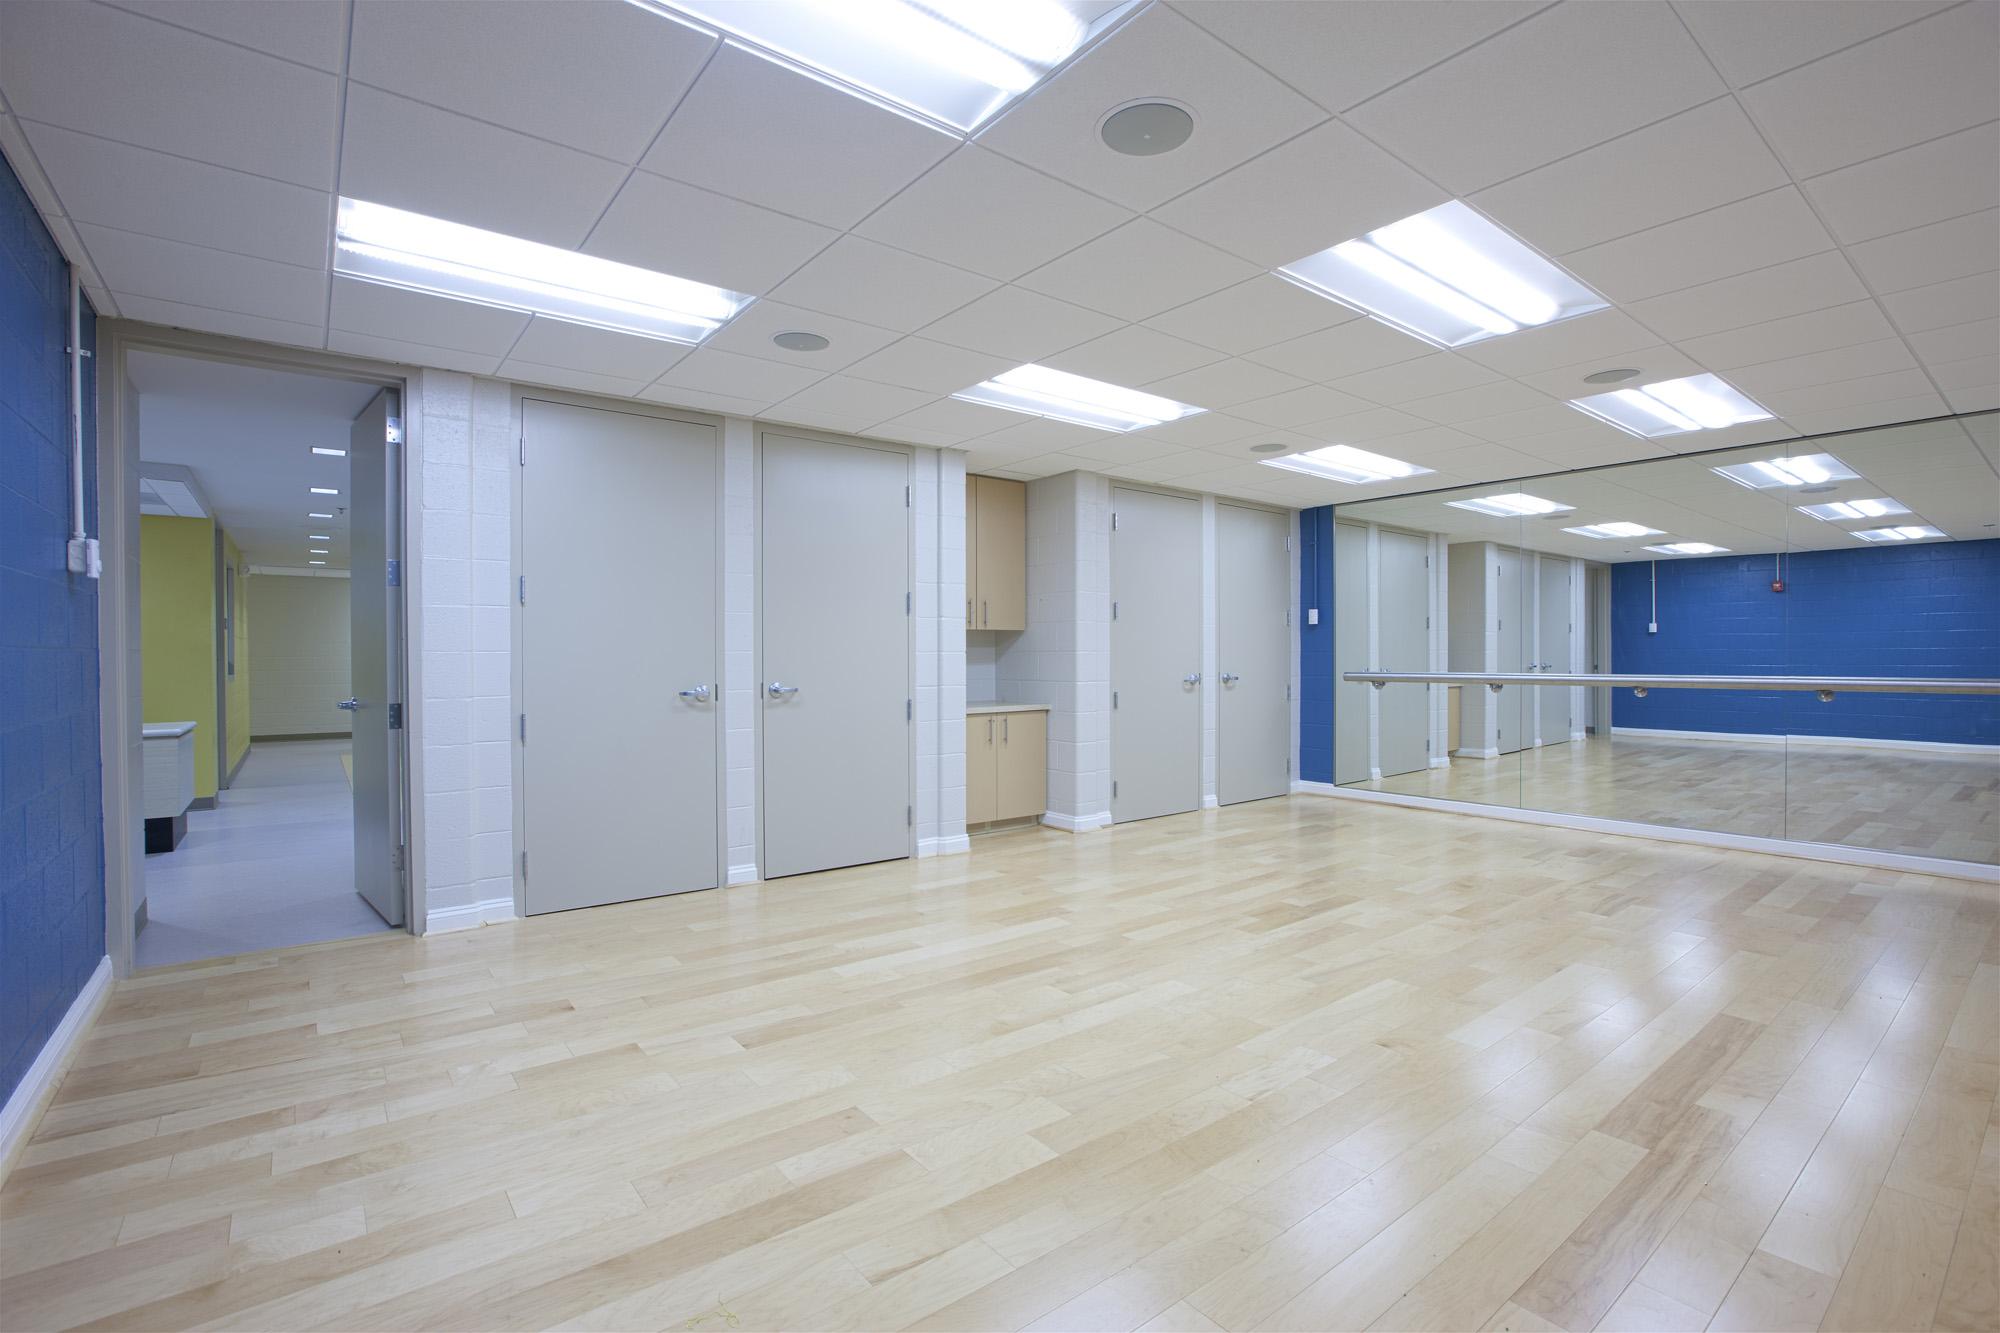 Bald Eagle Rec Center Interior Image-145494.jpg